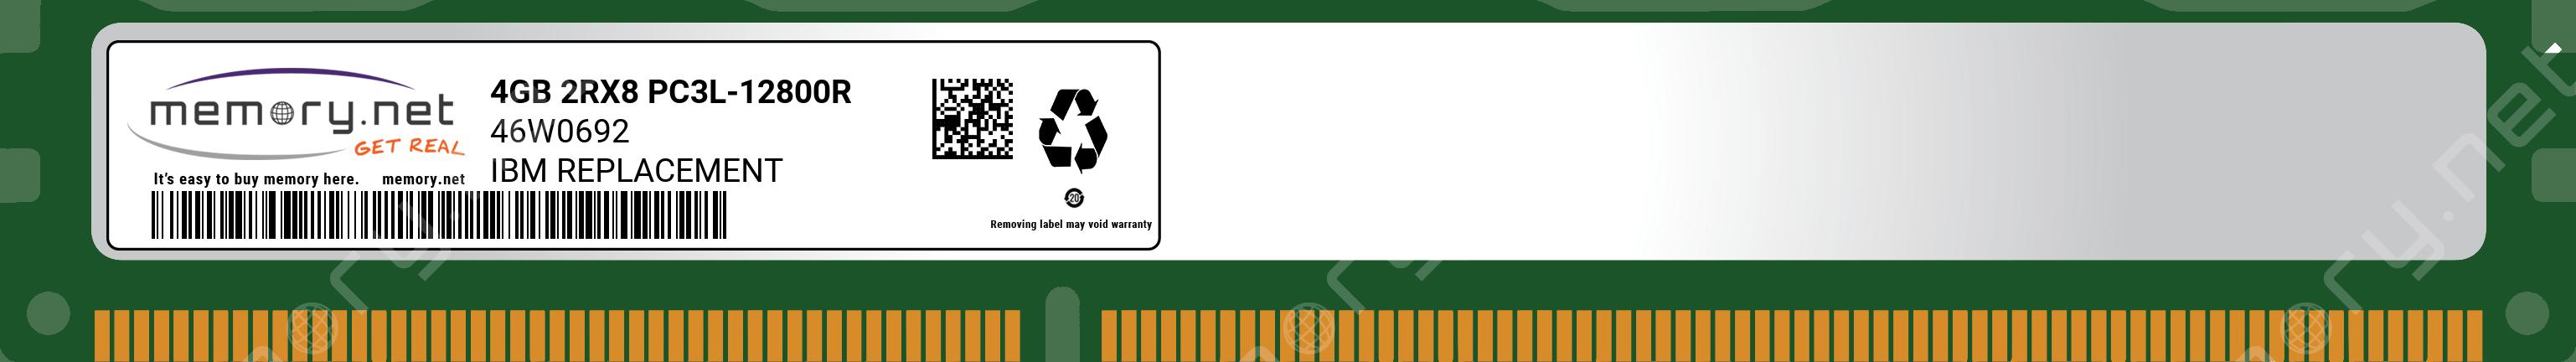 46W0692